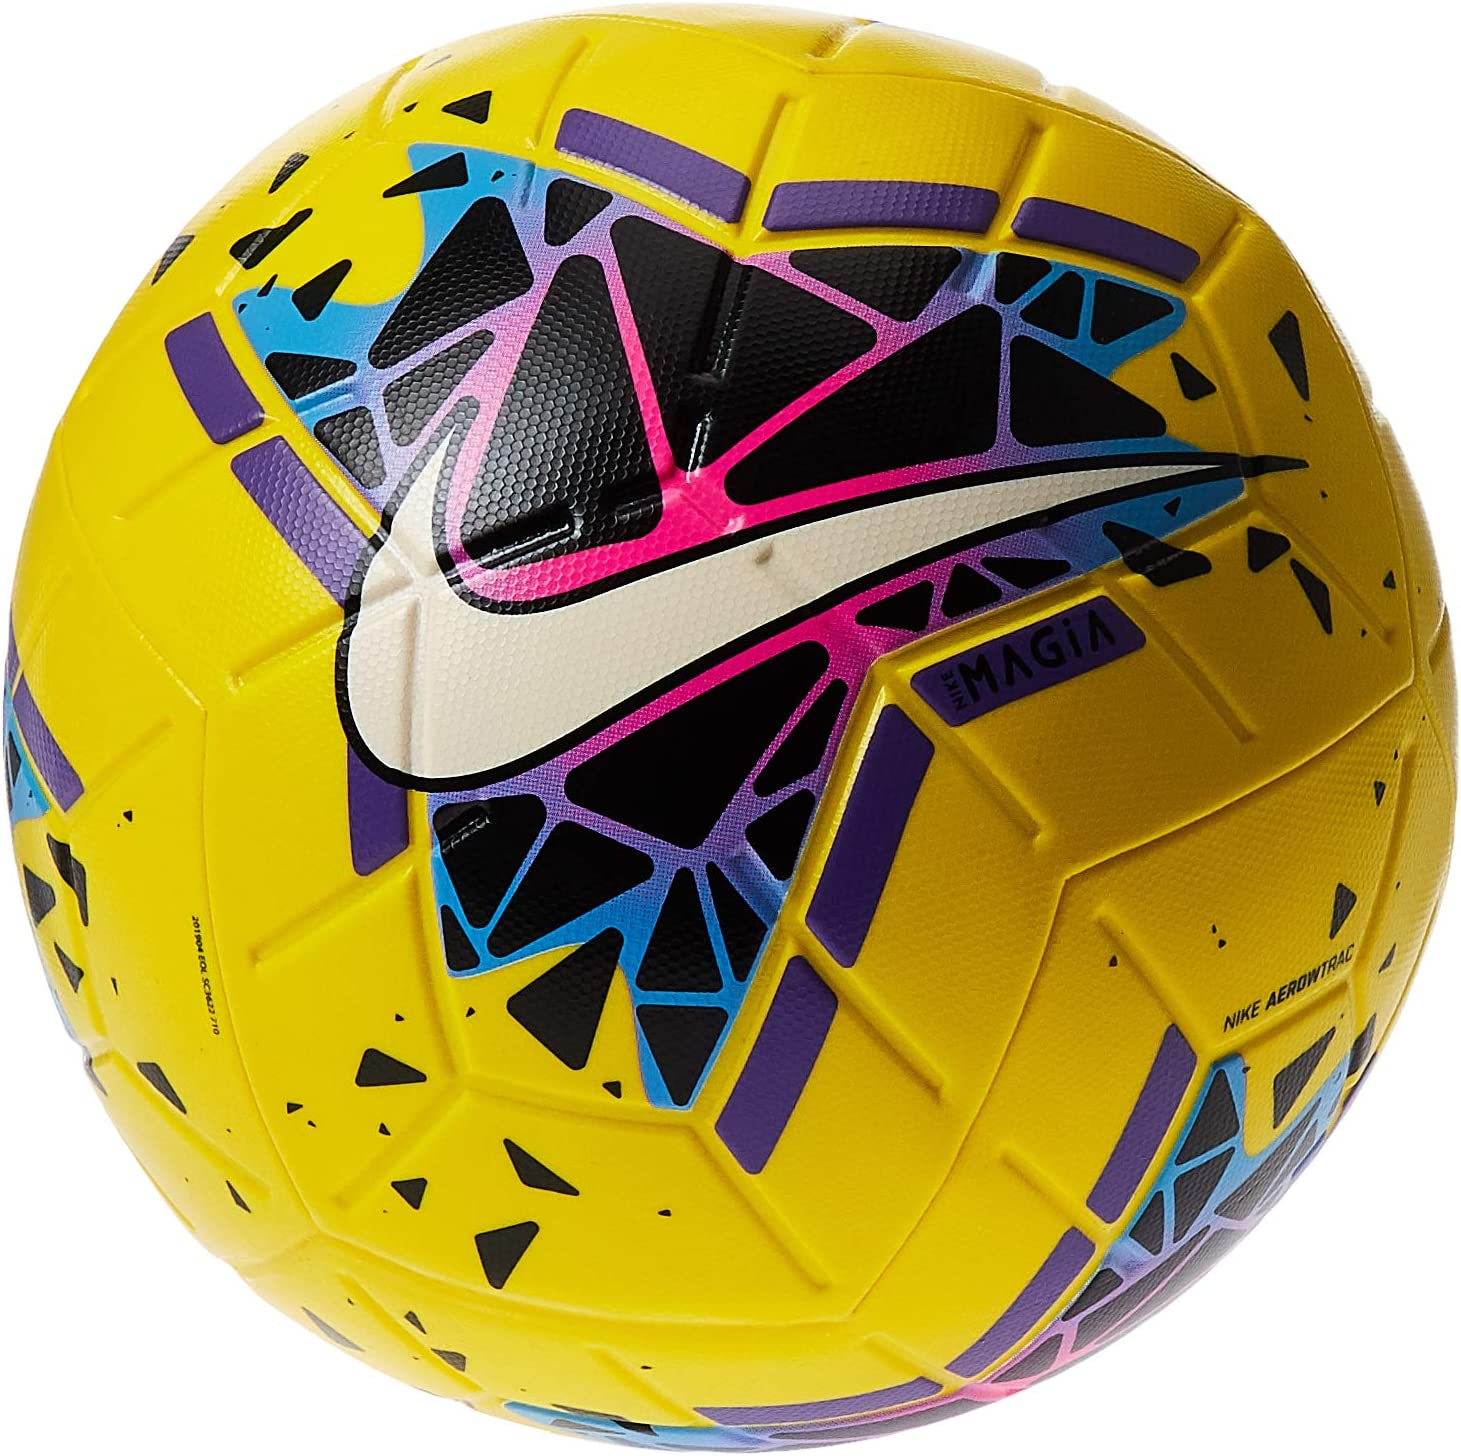 Nike NK Magia Balones Fútbol, Adultos Unisex, Multicolor (Yellow ...